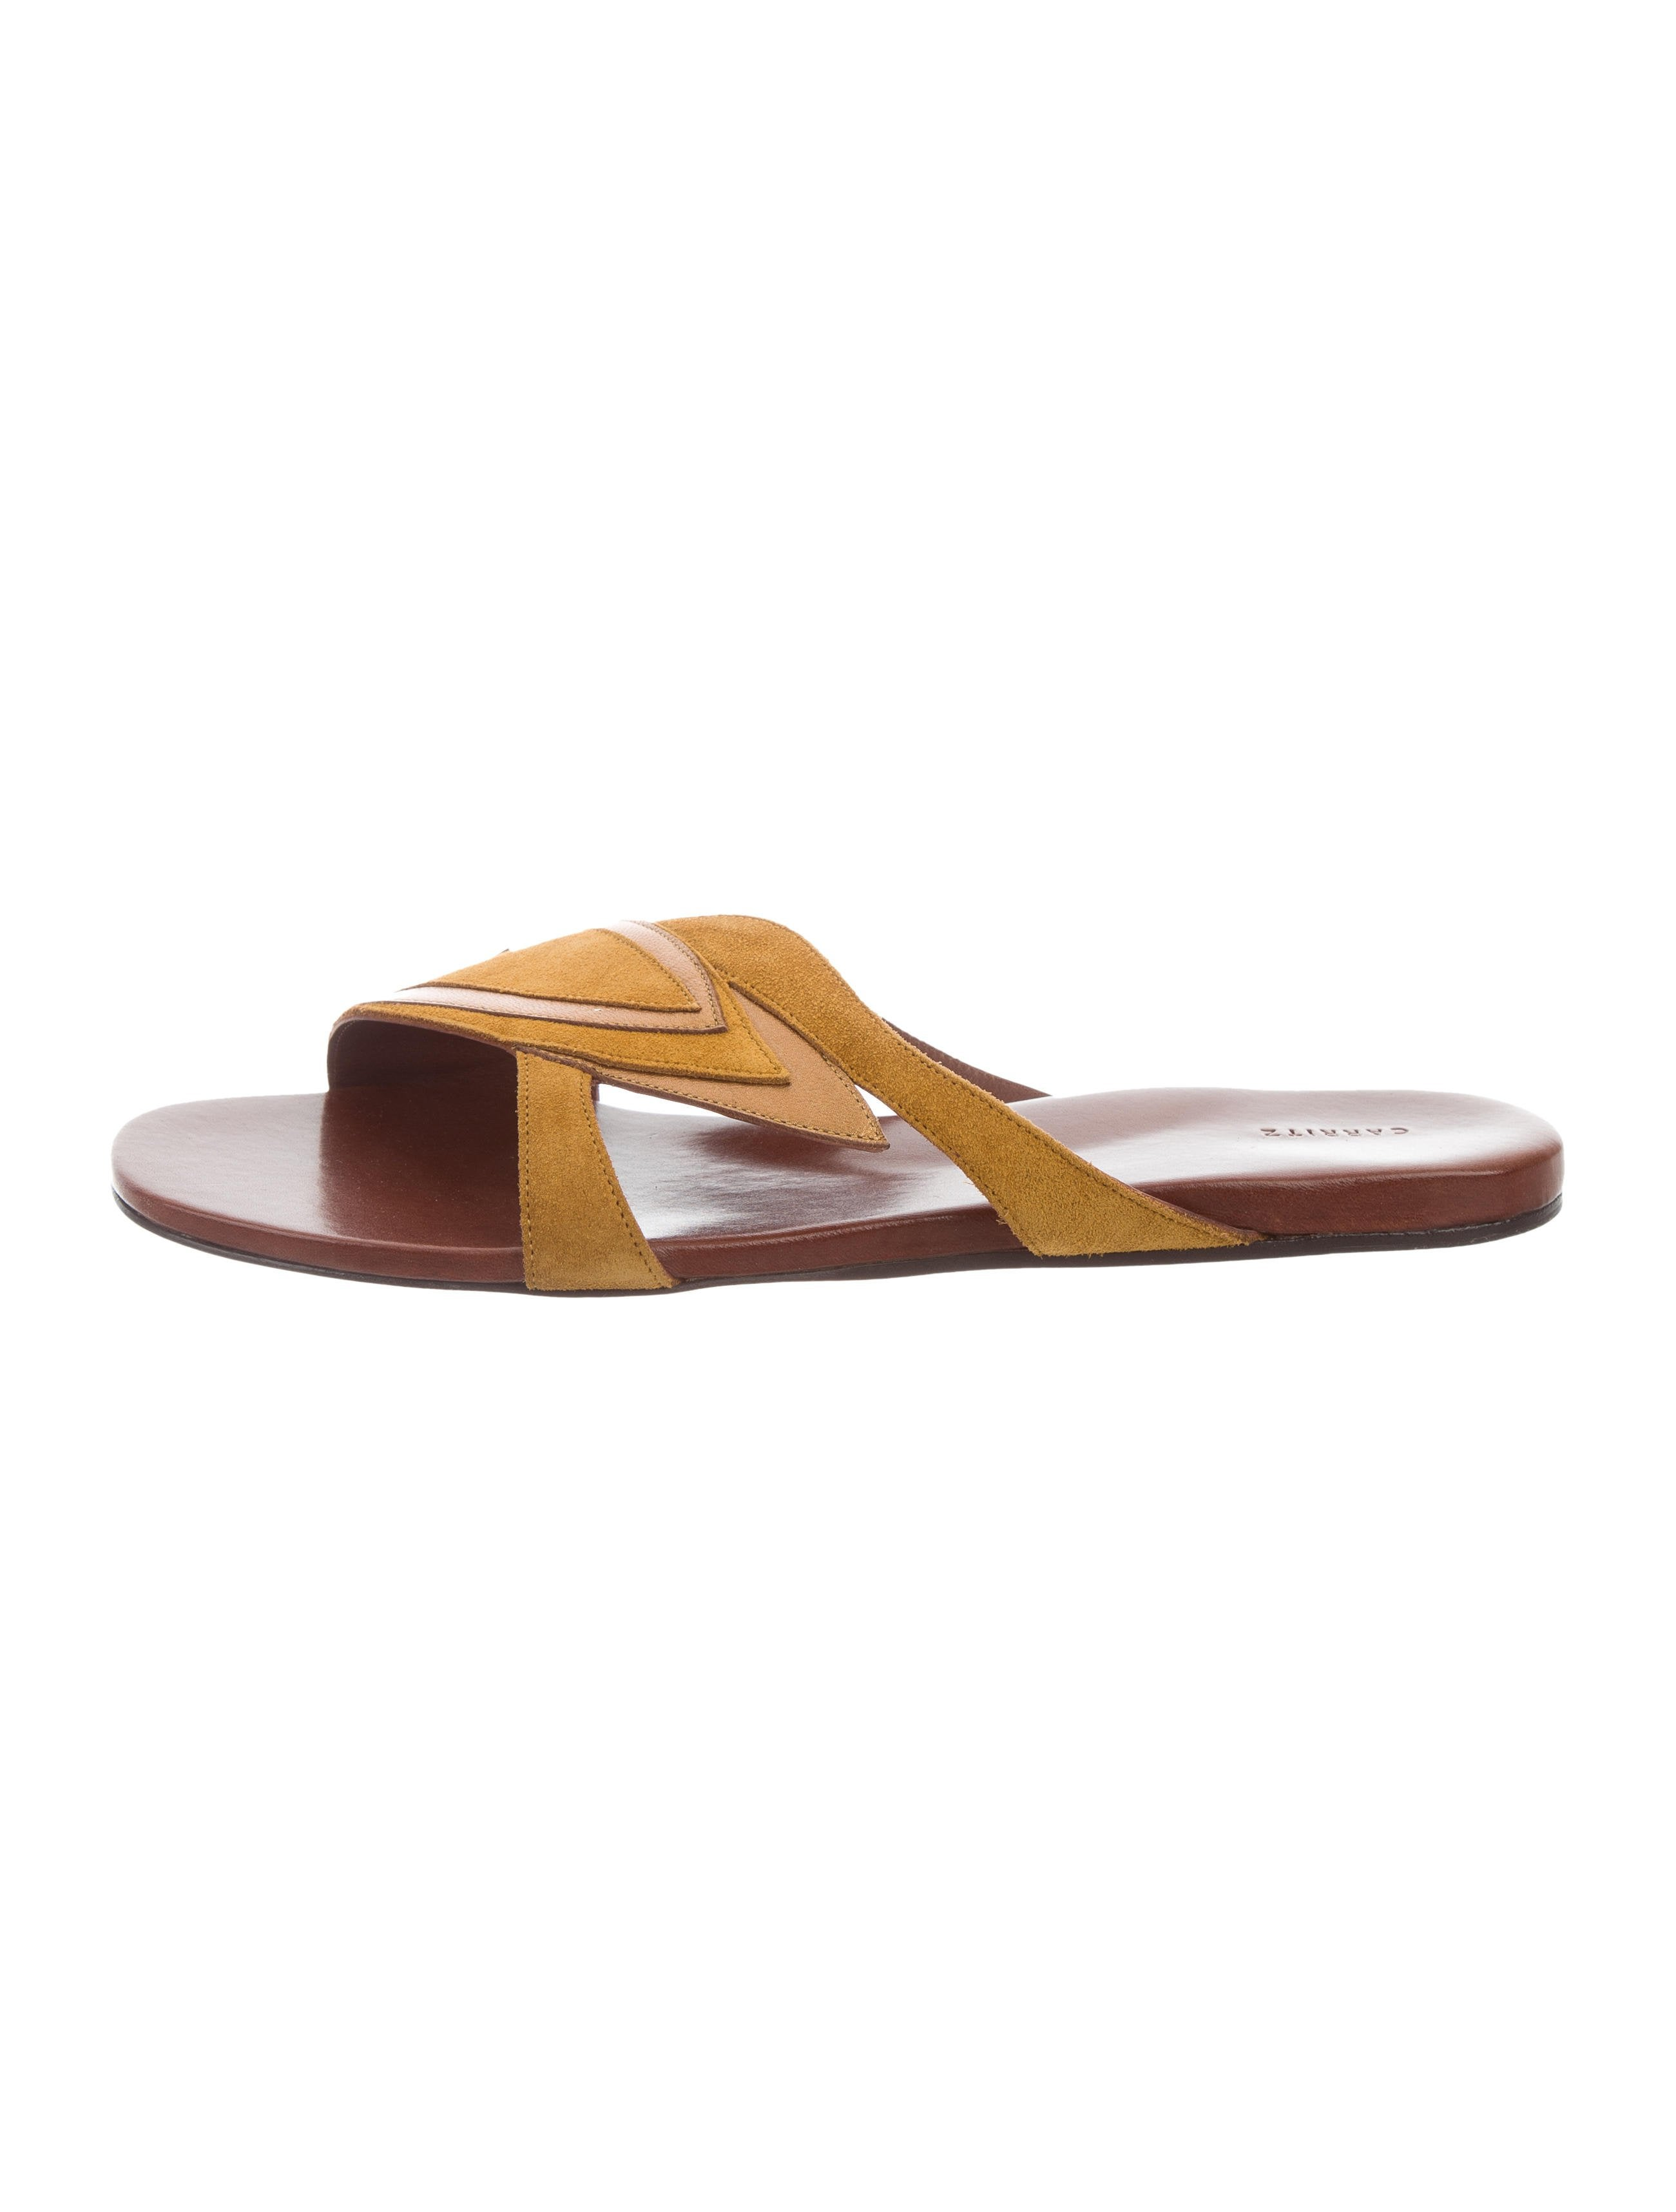 Carritz Suede Slide Sandals for nice great deals cheap online cheapest price online popular cheap online 5Q7CYZPG